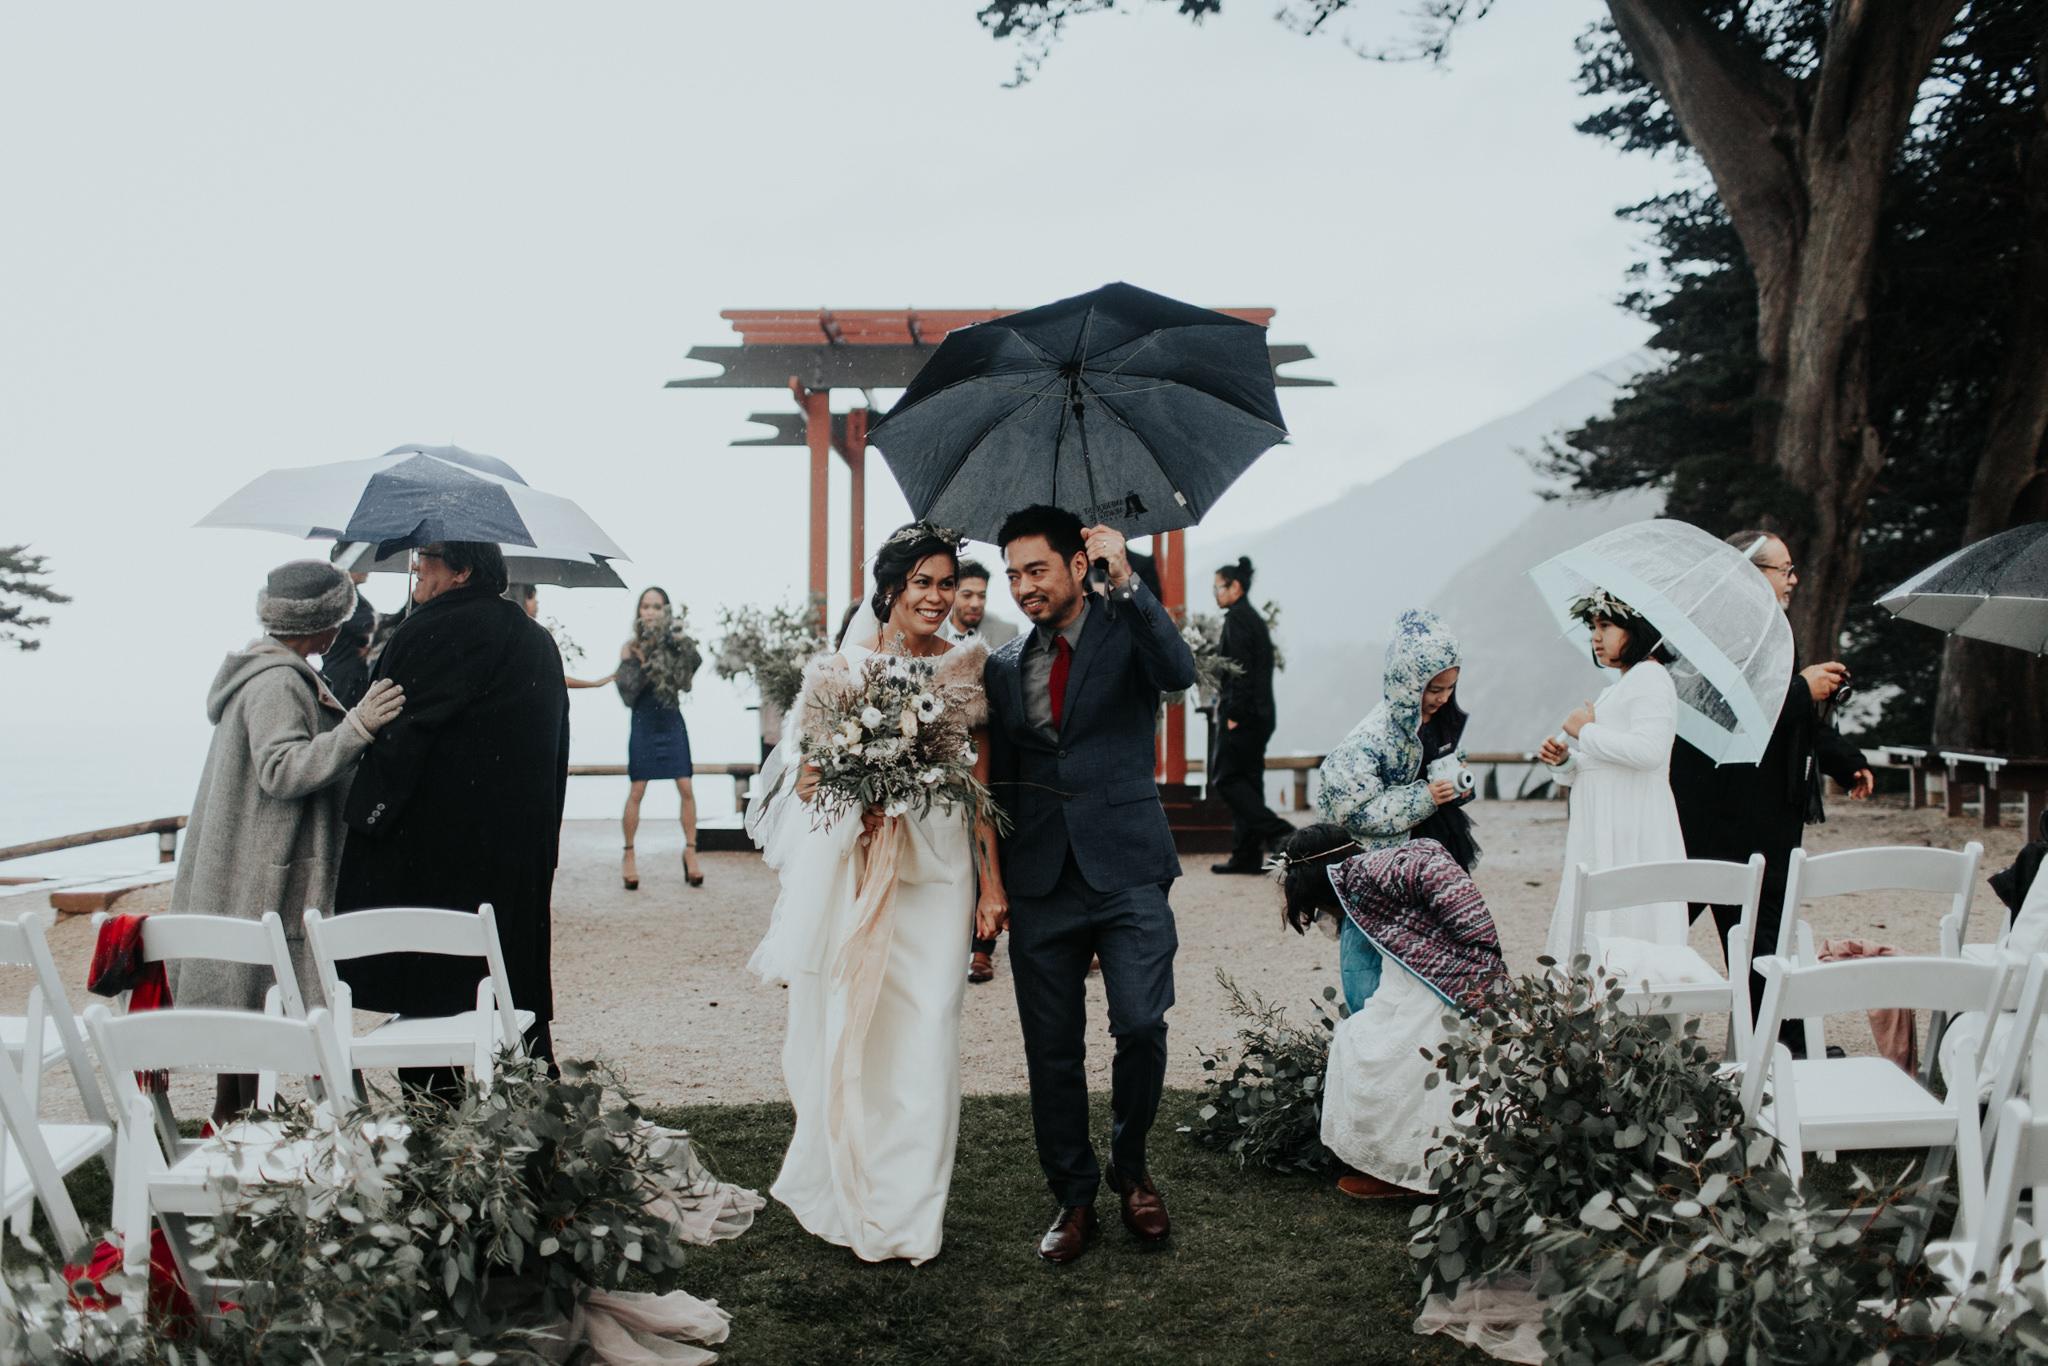 ragged point inn wedding during rain winter coastal wedding umbrellas